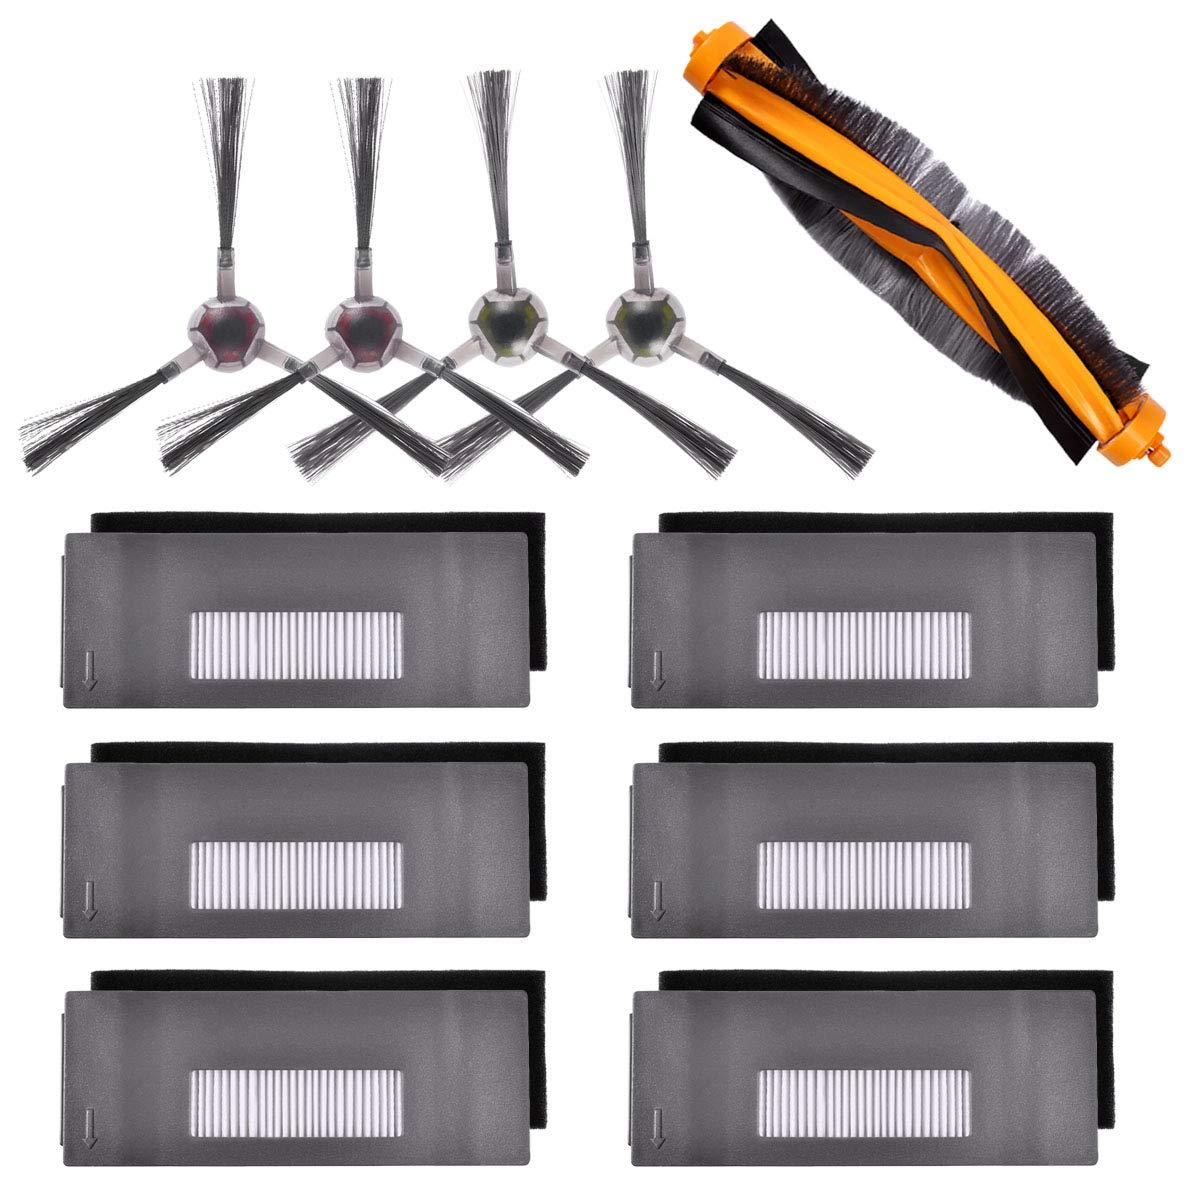 Kit de accesorios para piojos Compatible con ECOVACS DEEBOT 901 900, aspiradora robótica, 6 filtros + 2 cepillos + 1 cepillo principal